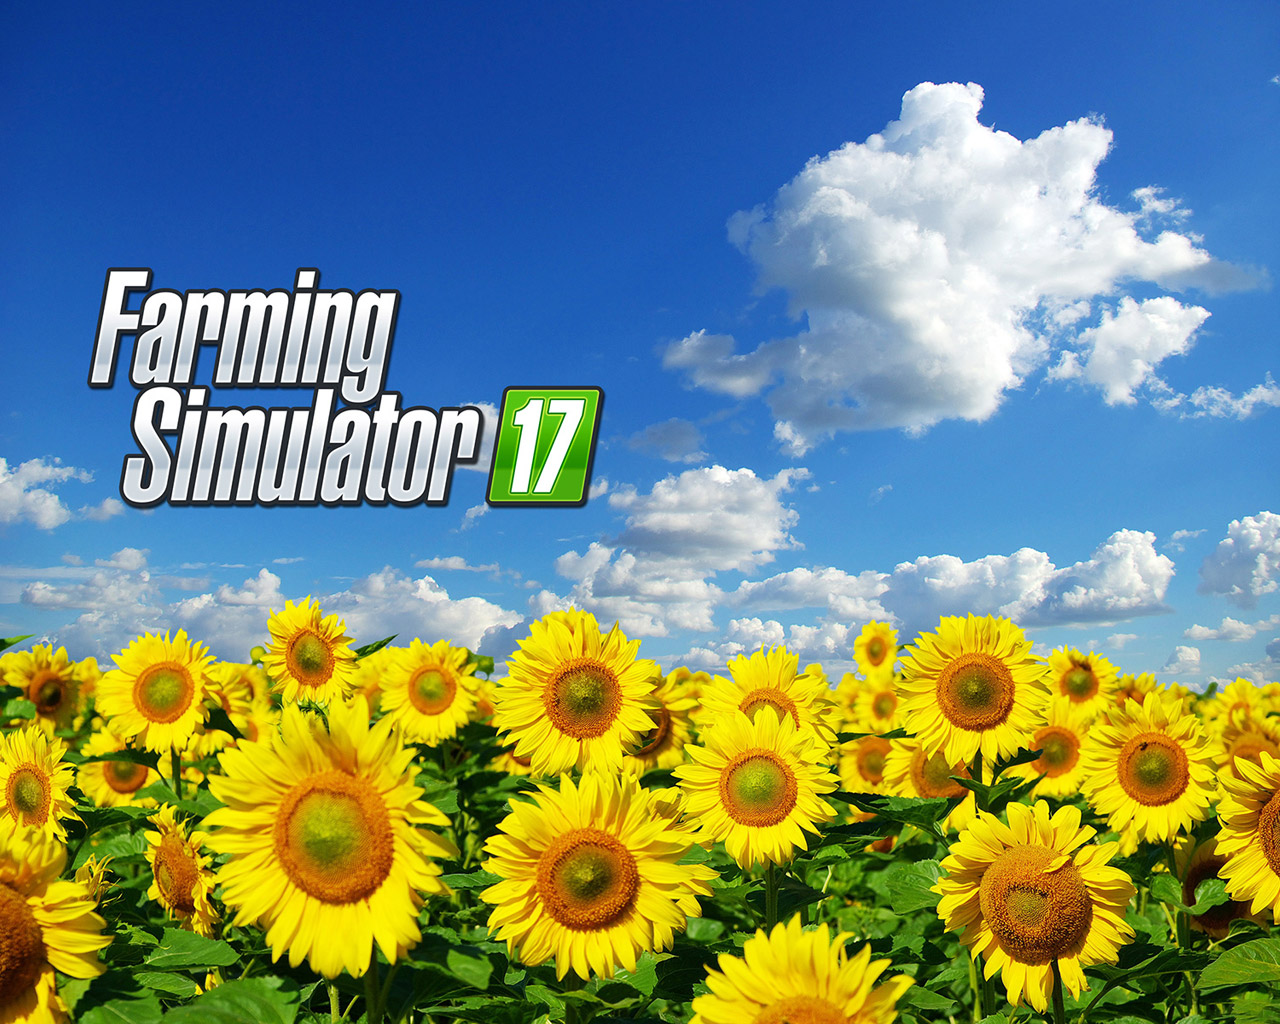 Free Farming Simulator 17 Wallpaper in 1280x1024